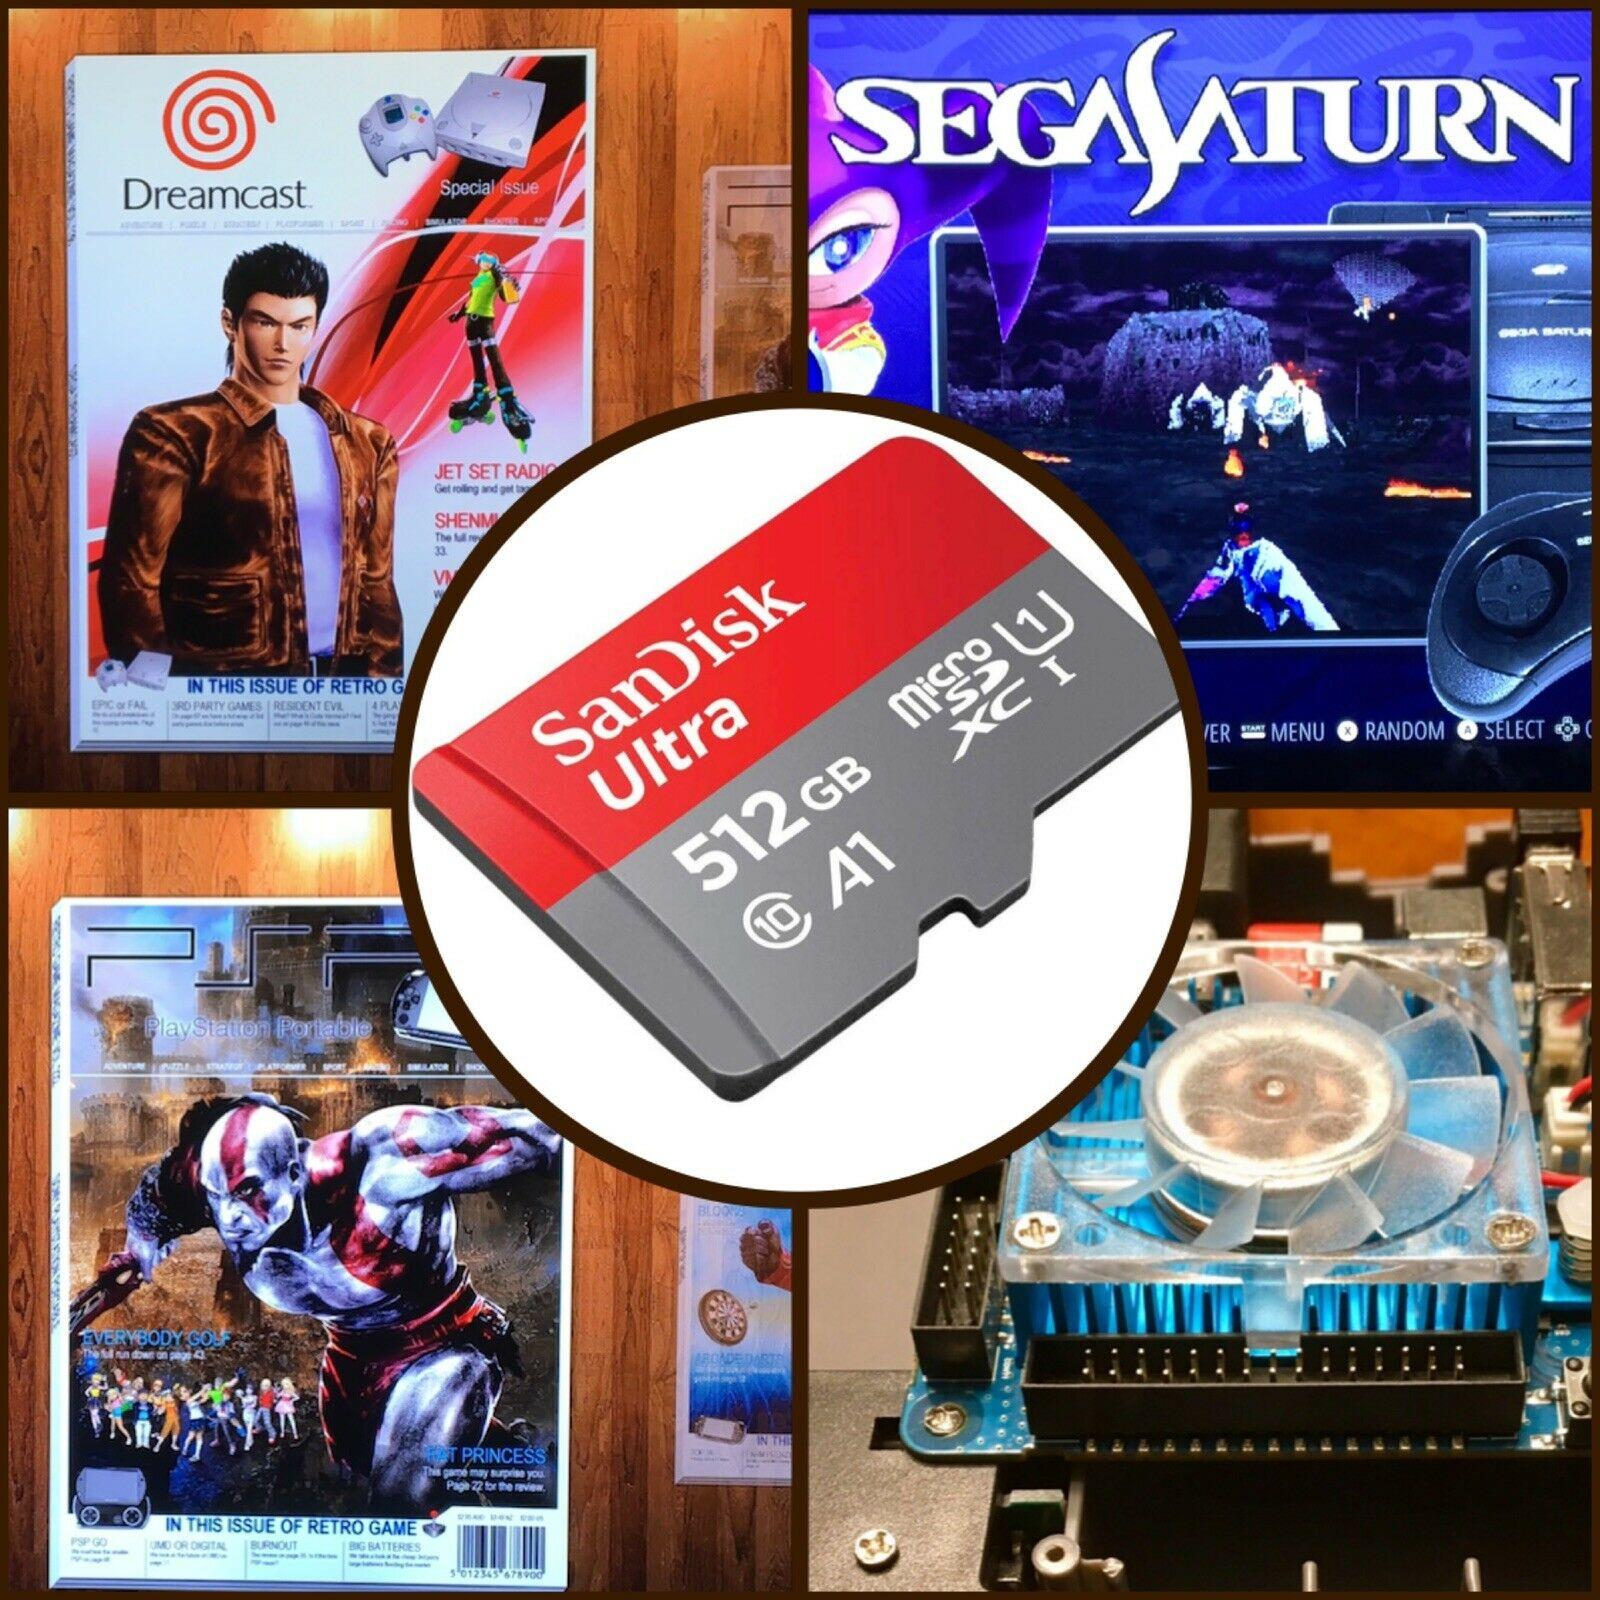 Retropie-بطاقة SD متعددة المحاكي ، 512 جيجا بايت ، Ora v1.65 ، Sega Saturn PSP N64 Naomi ، لـ ODROID XU4 20,000 لعبة محملة مسبقًا ، boxart 3D